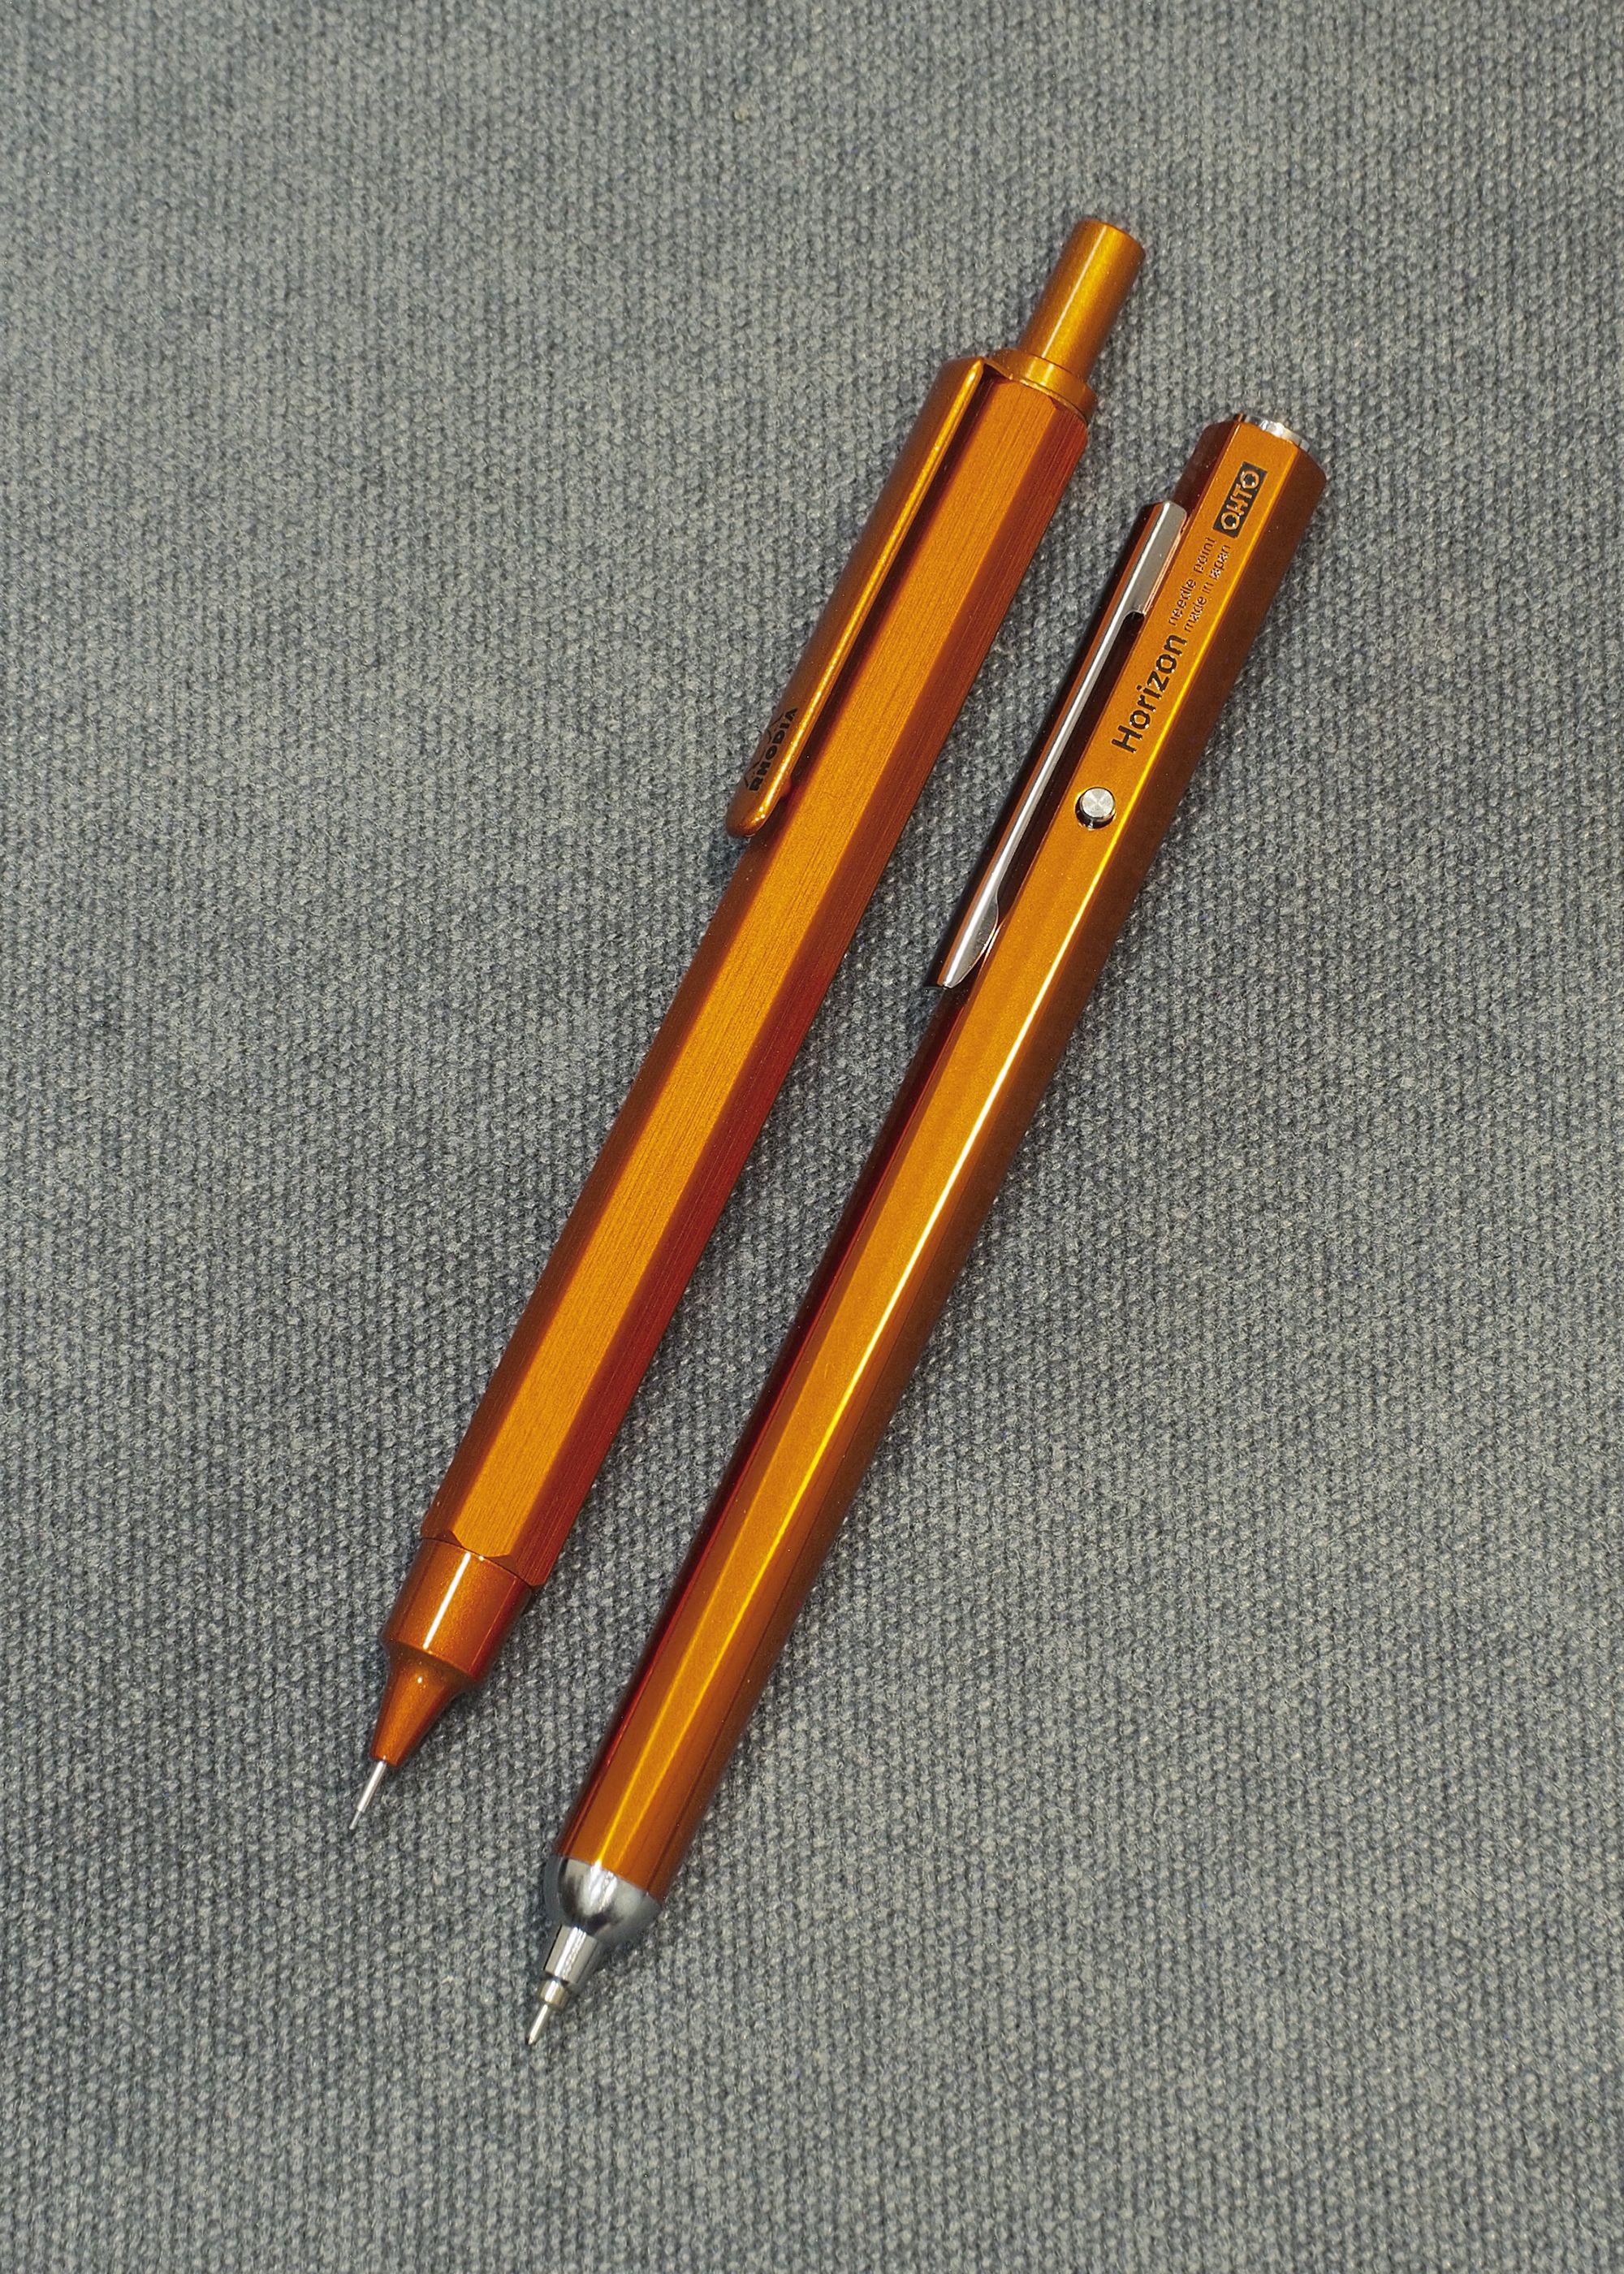 Pencil And In Color Drawing: Orange Hexagonal: RHODIA ScRipt Mechanical Pencil 0.5mm